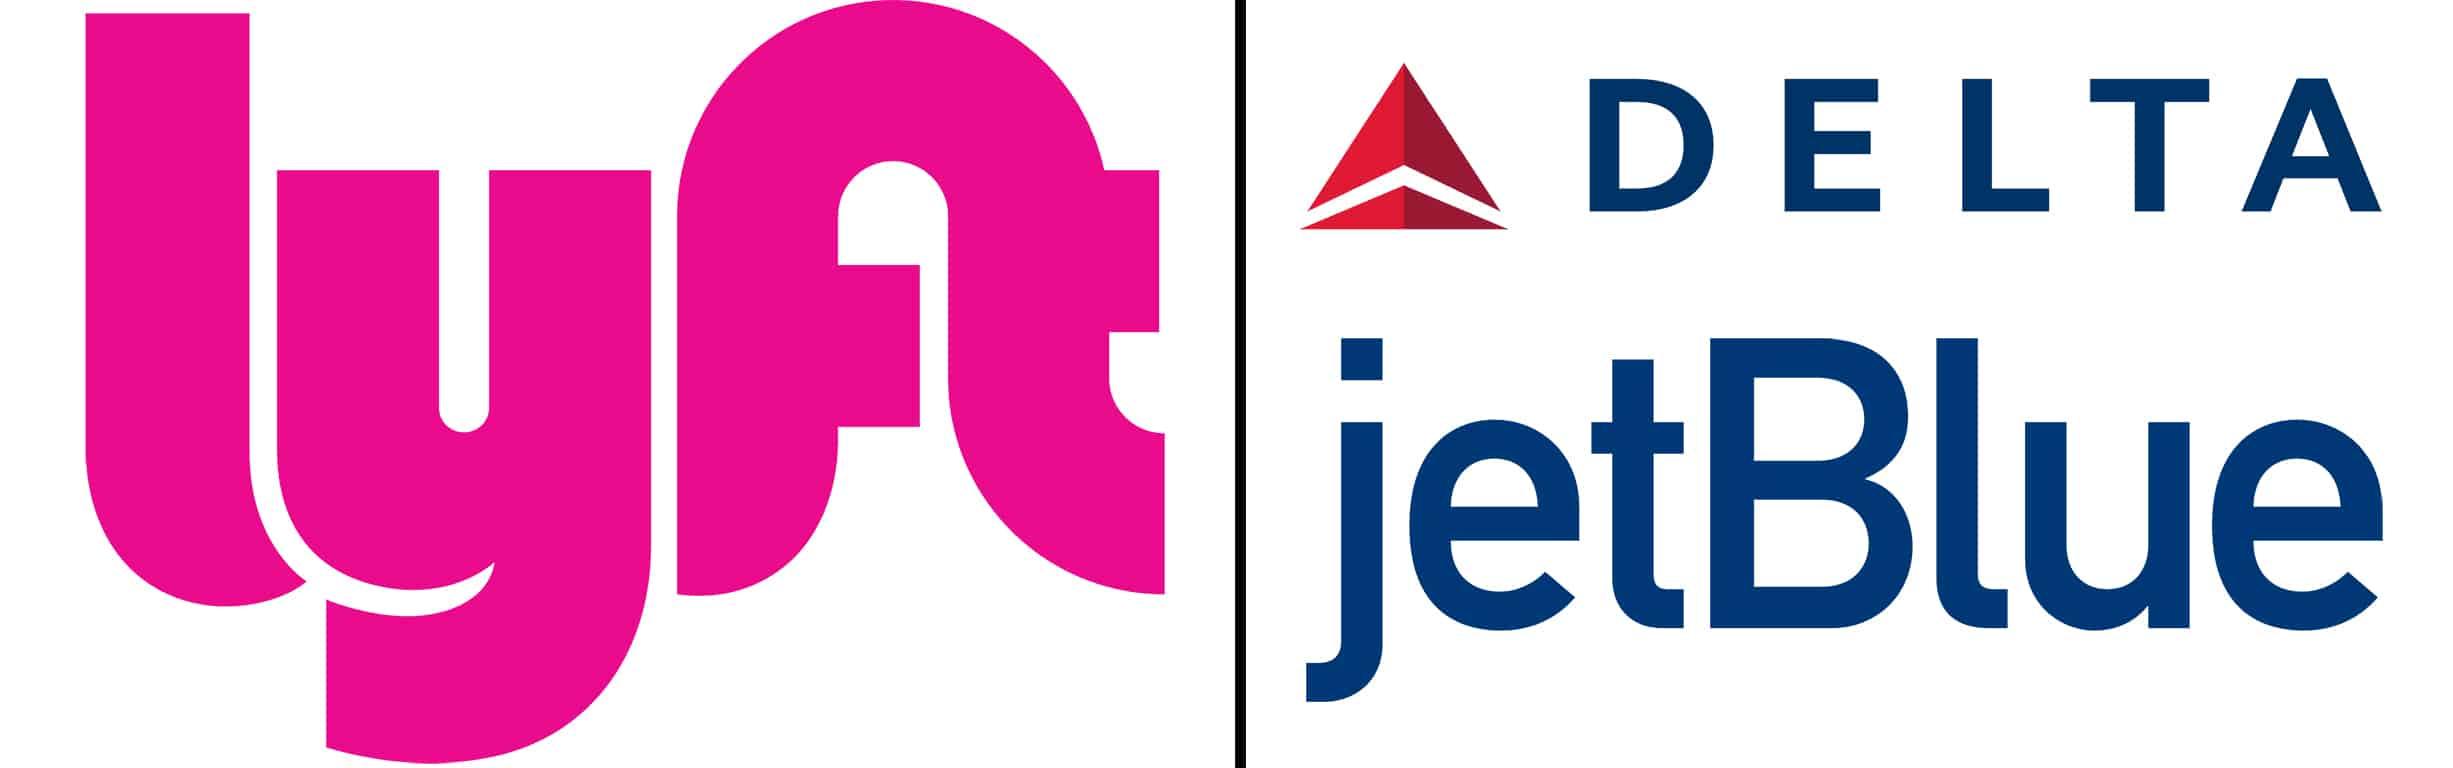 Lyft partners Delta and JetBlue